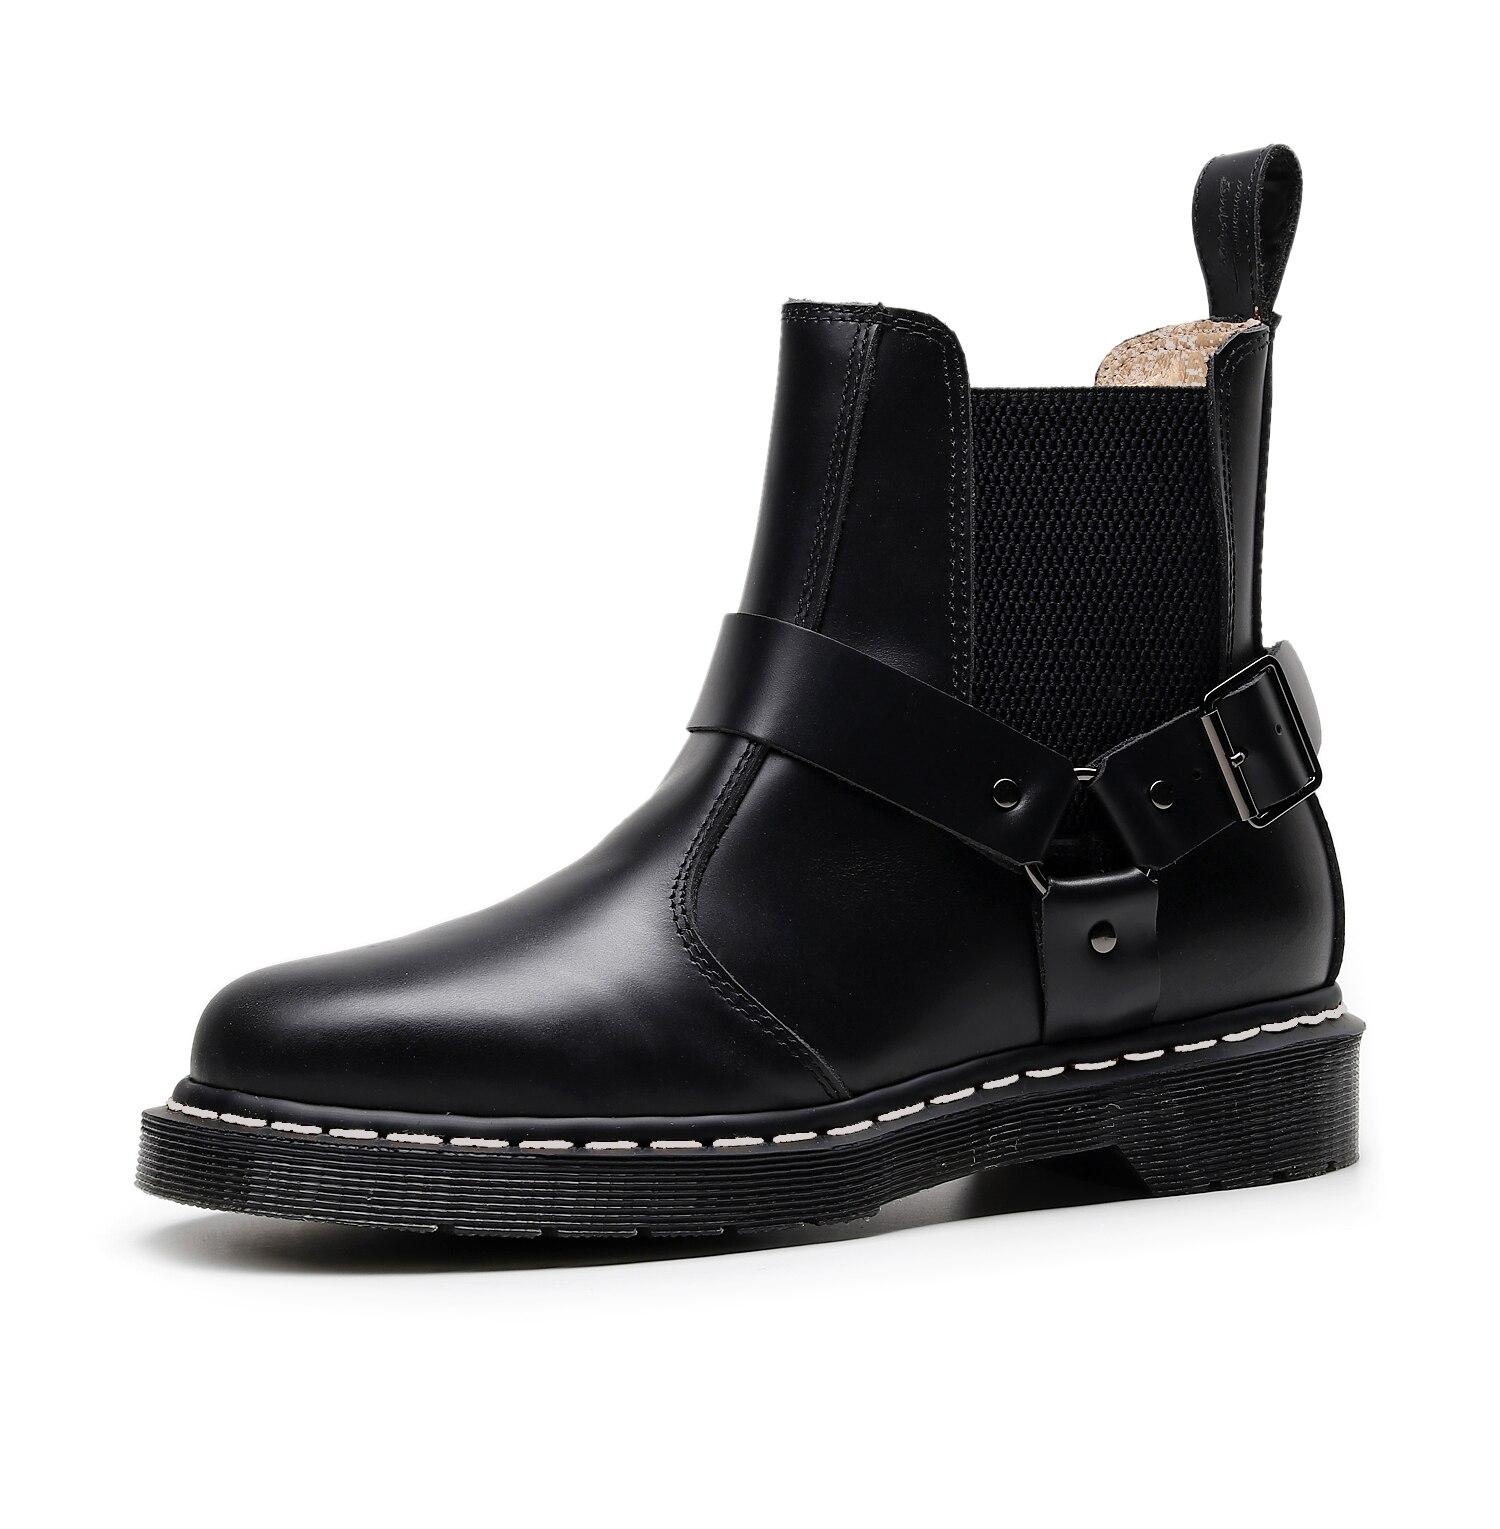 Vastwave Lover Coupler British Vintage Martens Unisex Doc Women Leather Boots Martin Shoes Woman Ankle Boots Luxury Winter Boots